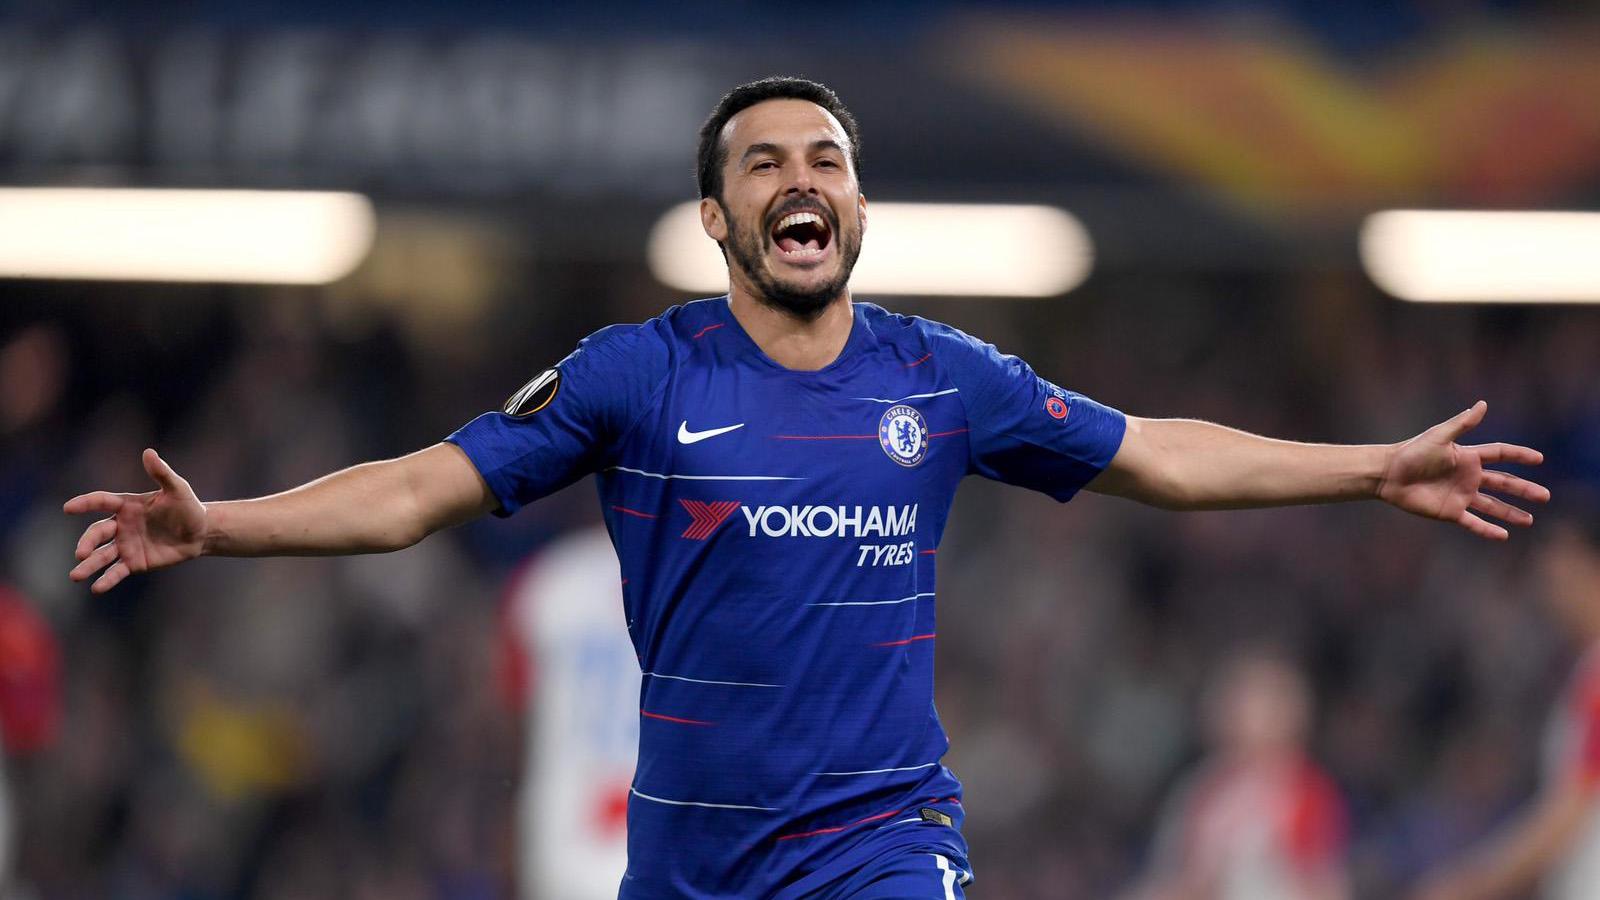 Pedro on-fire as Blues reach semi-finals (4-3)